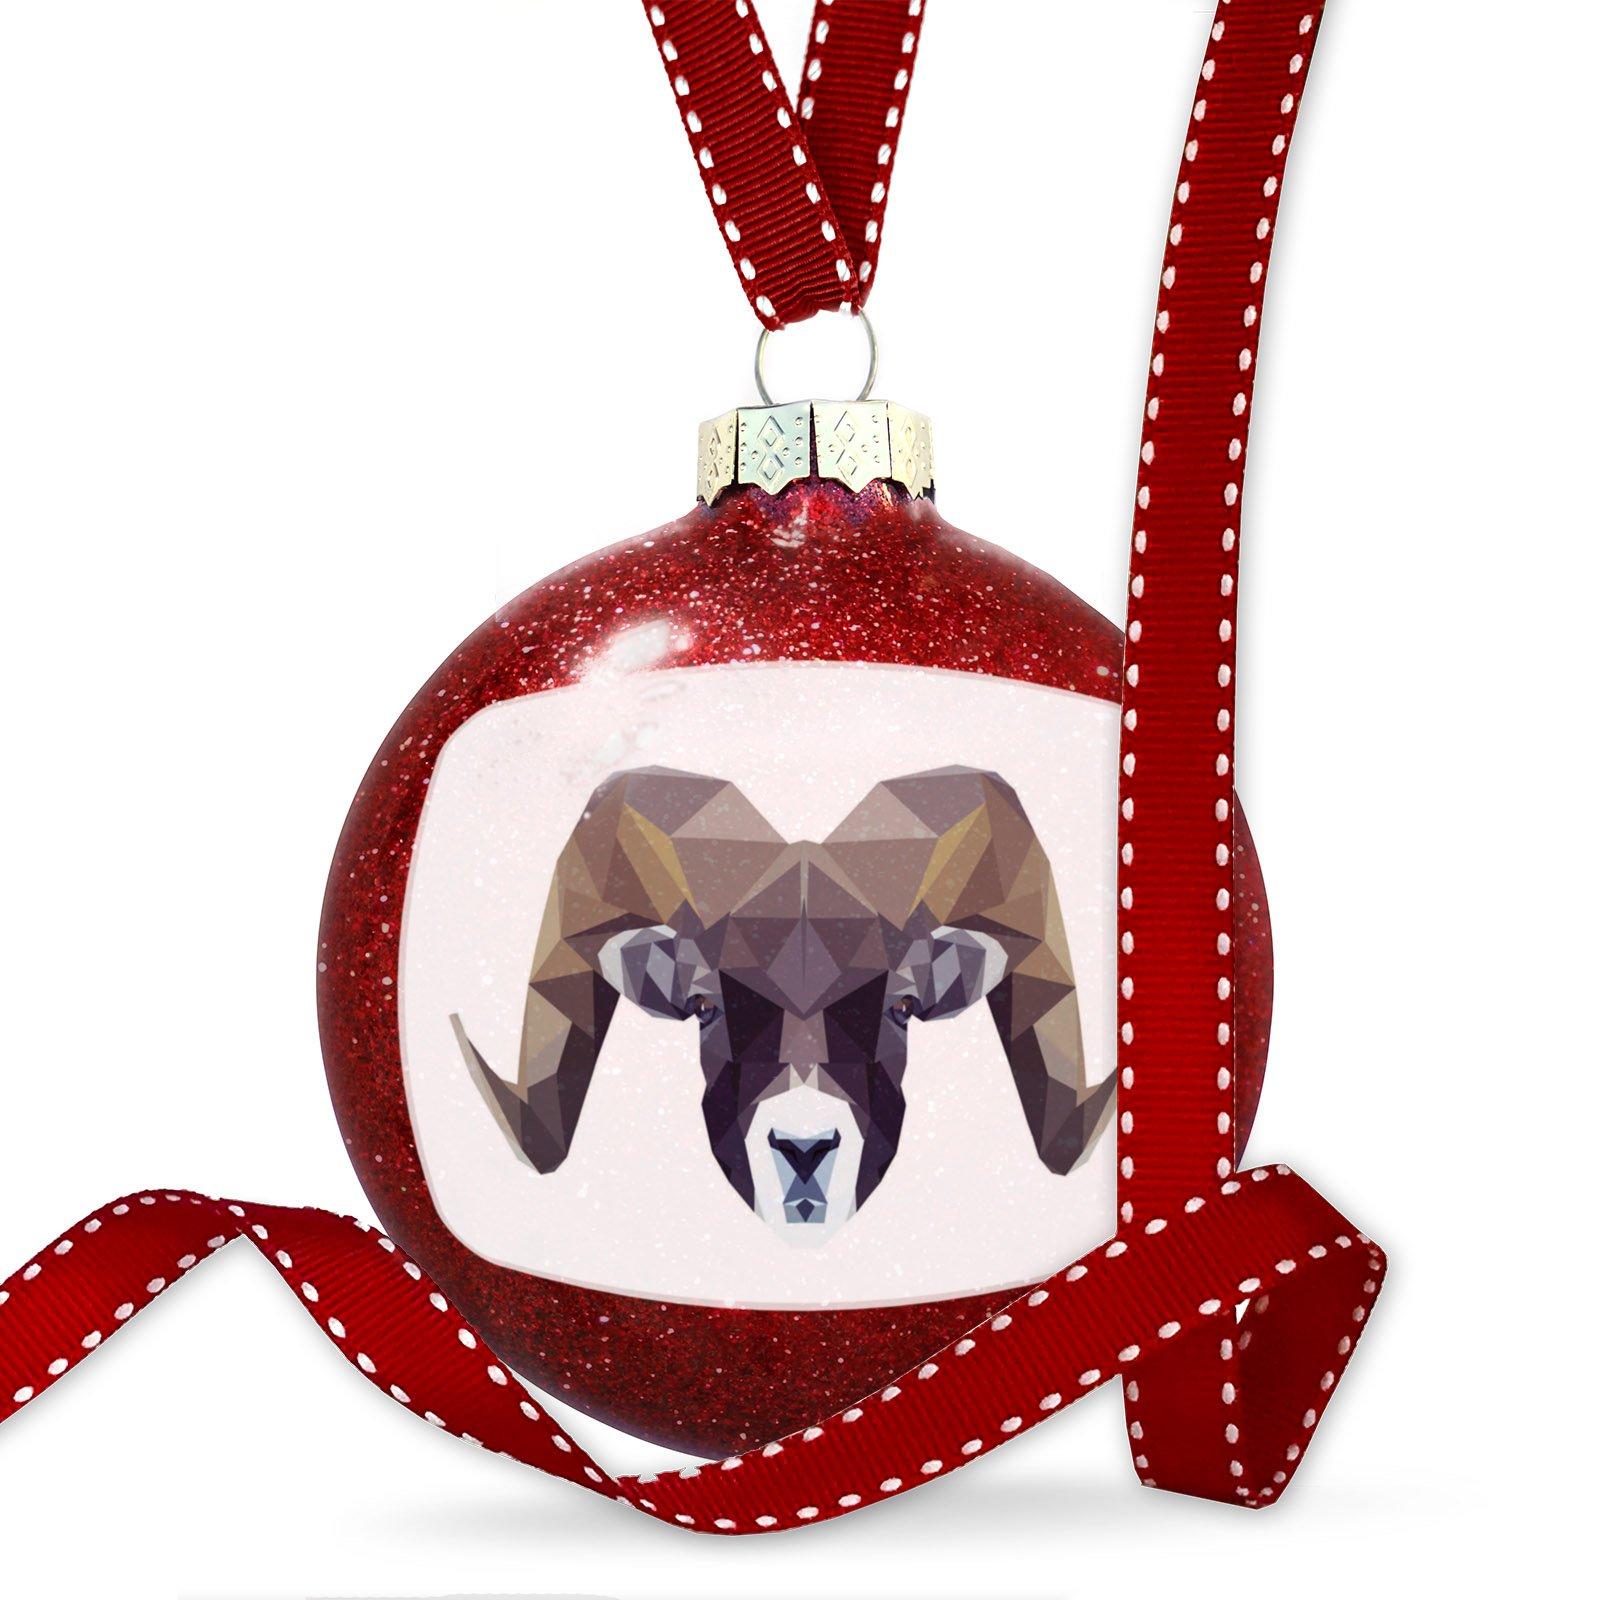 Christmas Decoration Geometric Animal art Ram Ornament by NEONBLOND